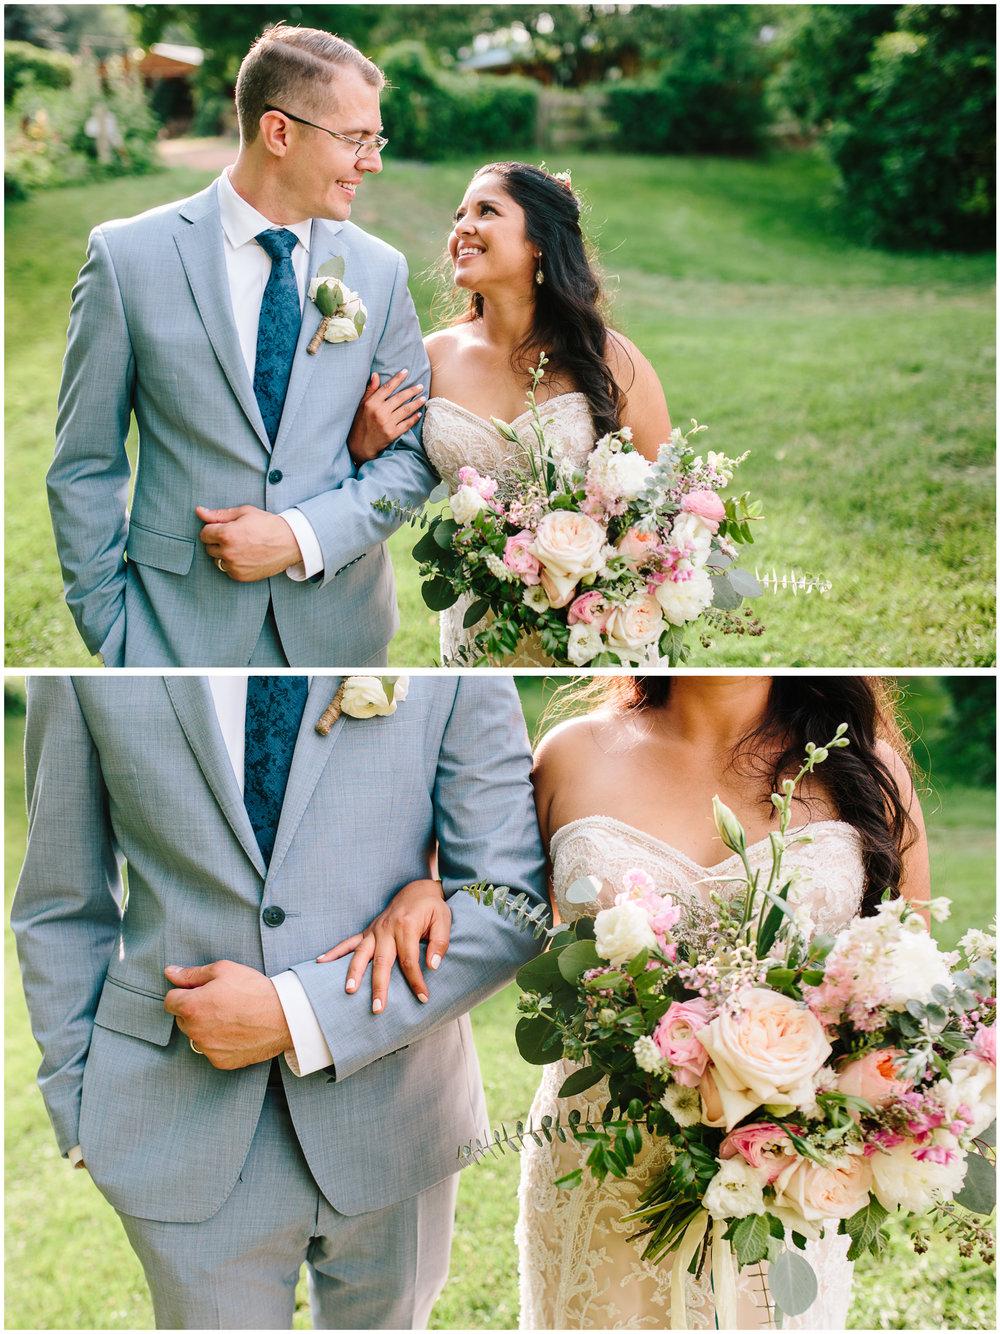 lyons_farmette_wedding_52.jpg